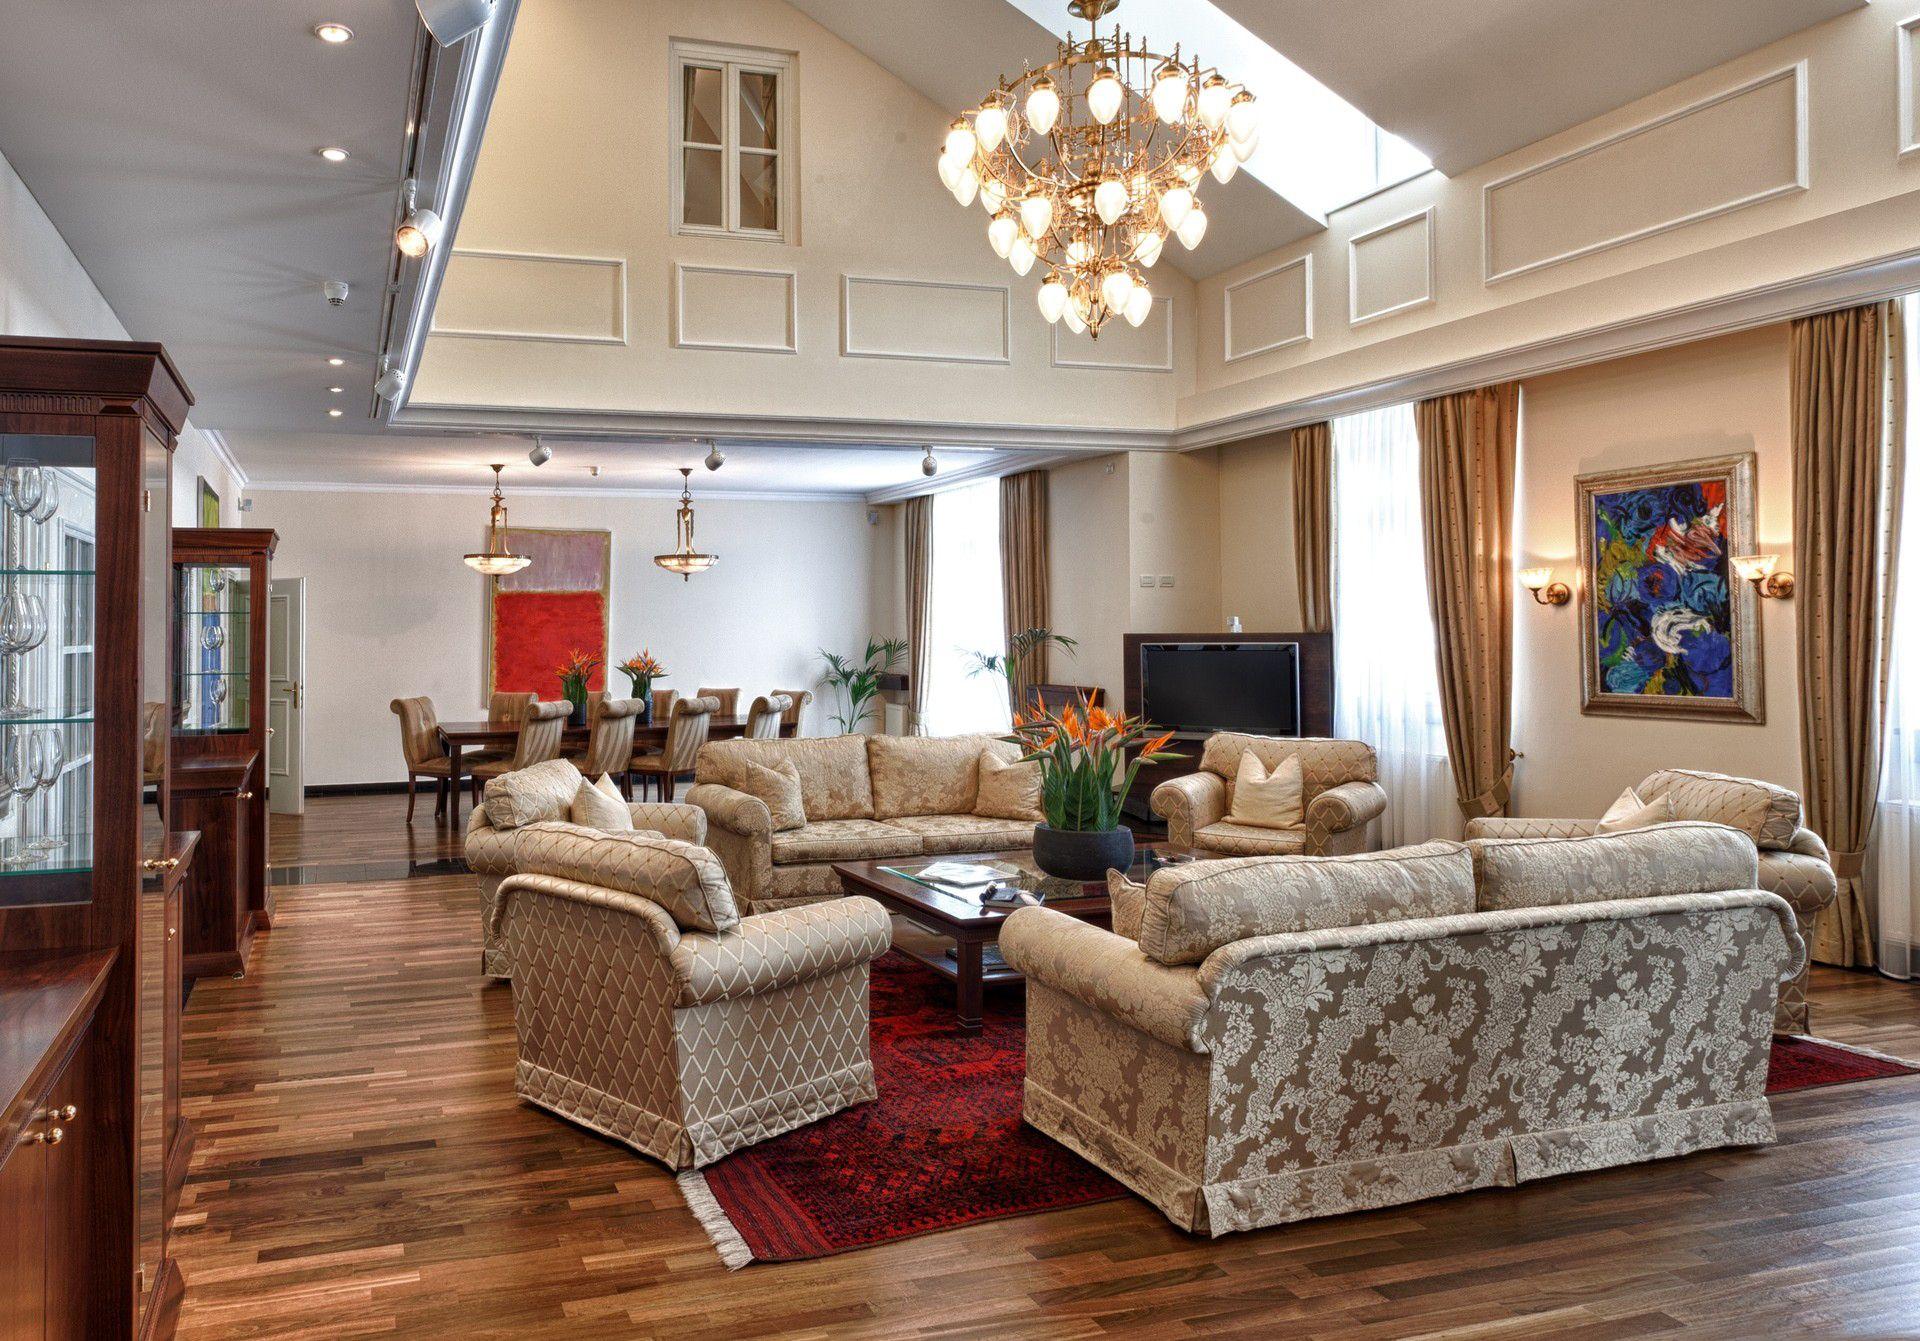 Beautiful Drawing Room Pics वास्तुशास्त्र के पांच आधारभूत तत्व